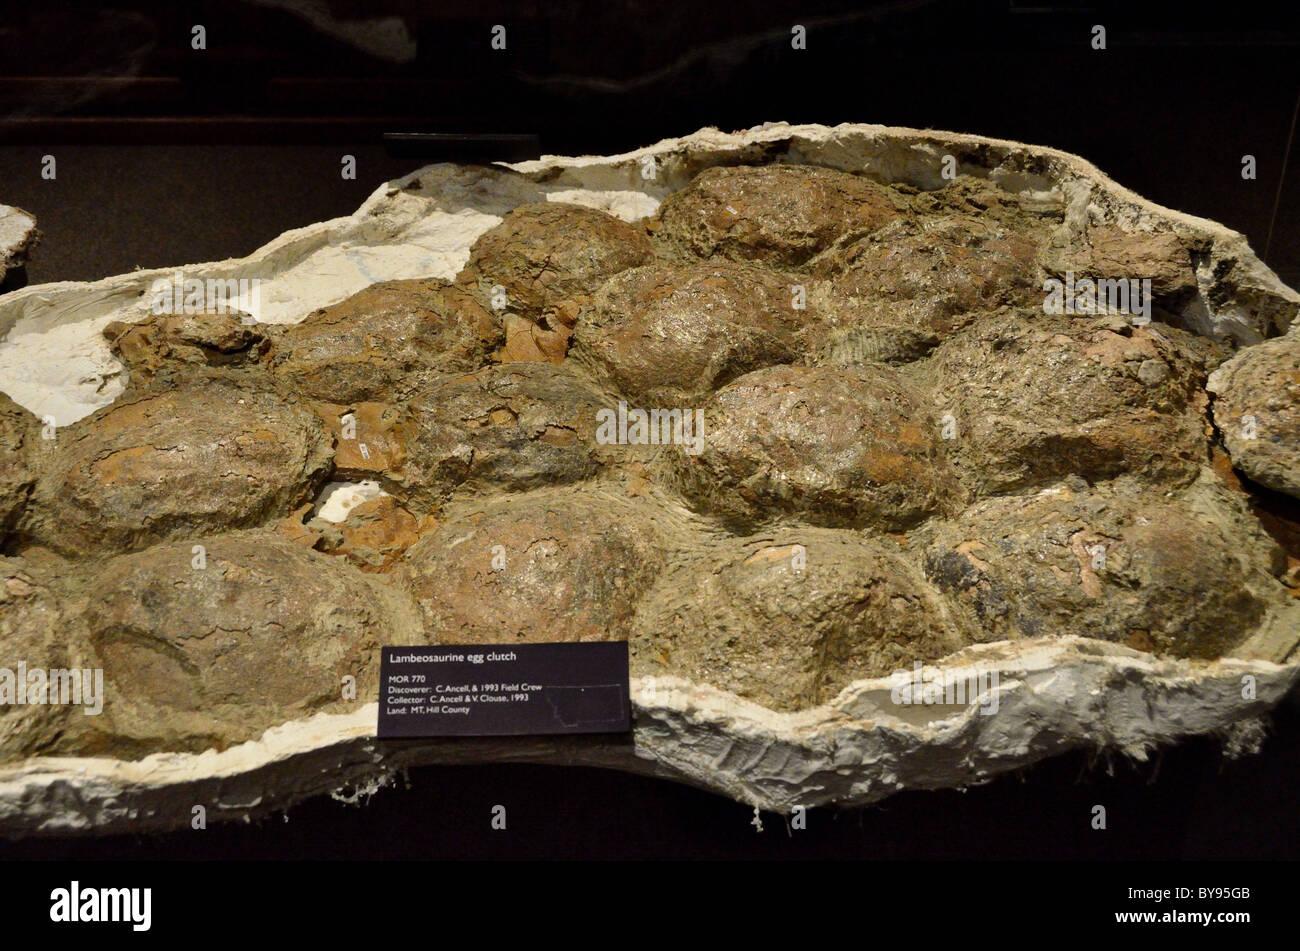 Fossilized Lambeosaurine dinosaur egg clutch. - Stock Image